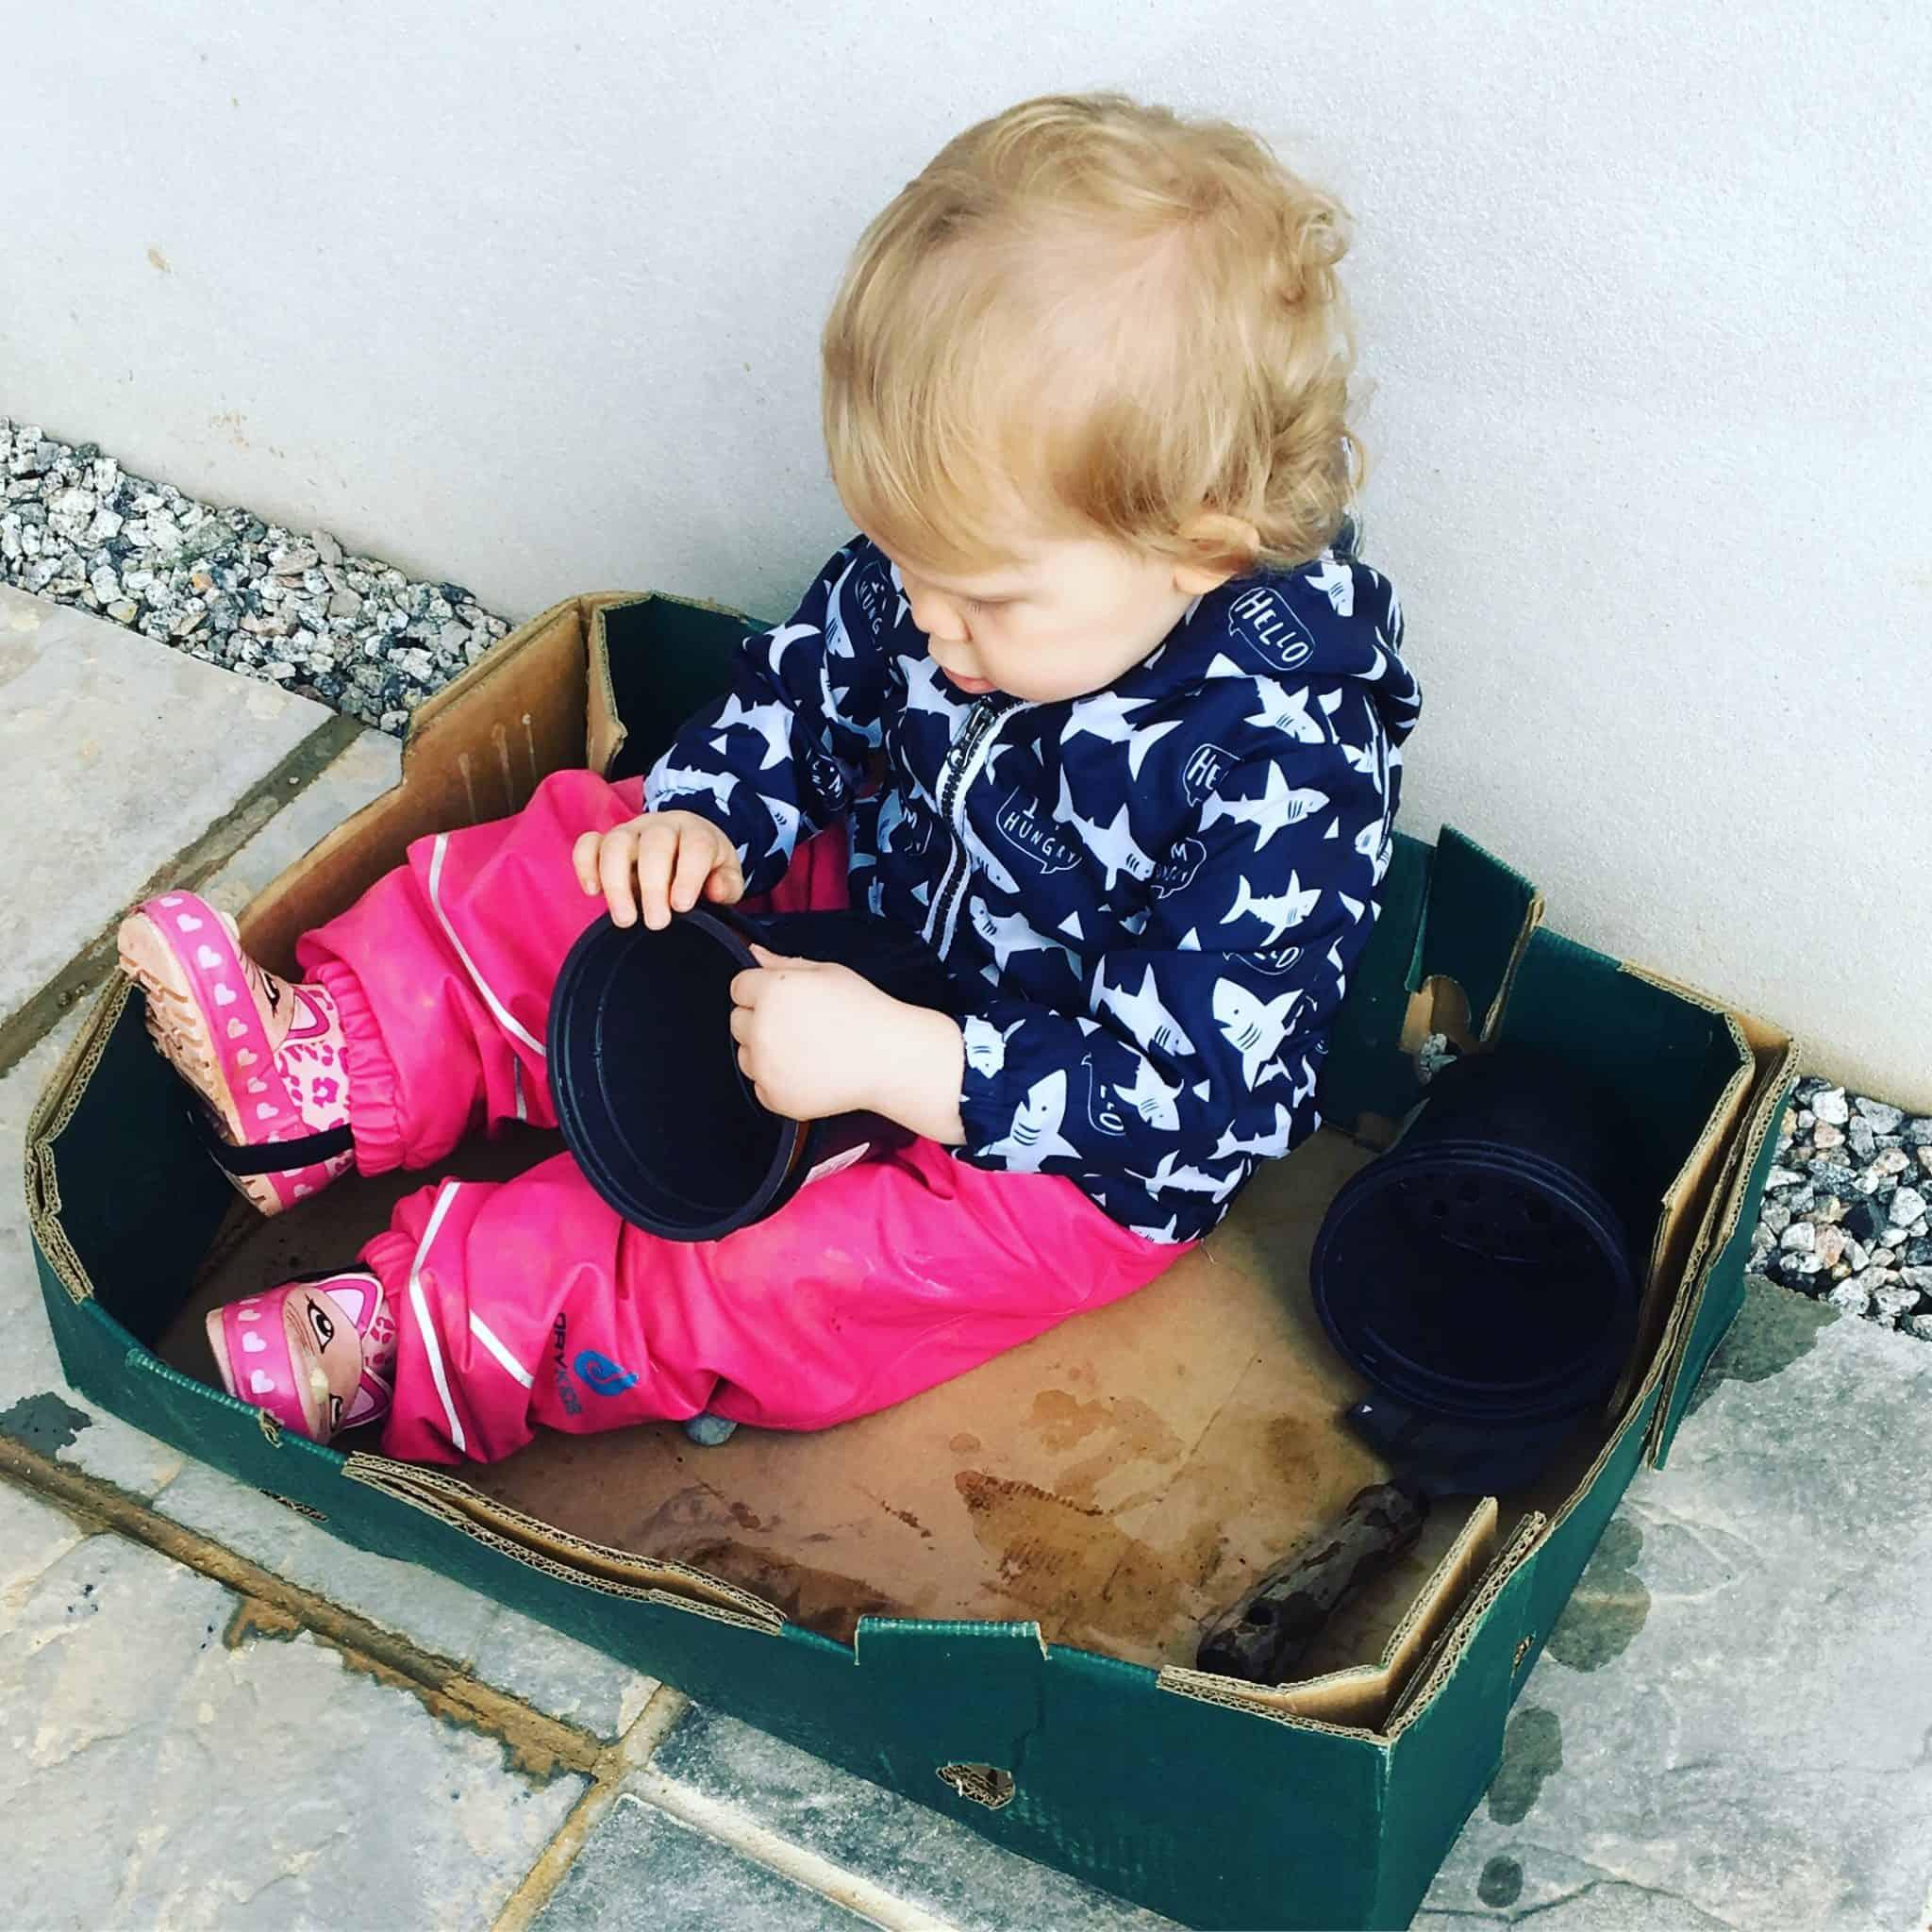 Baby girl playing outside